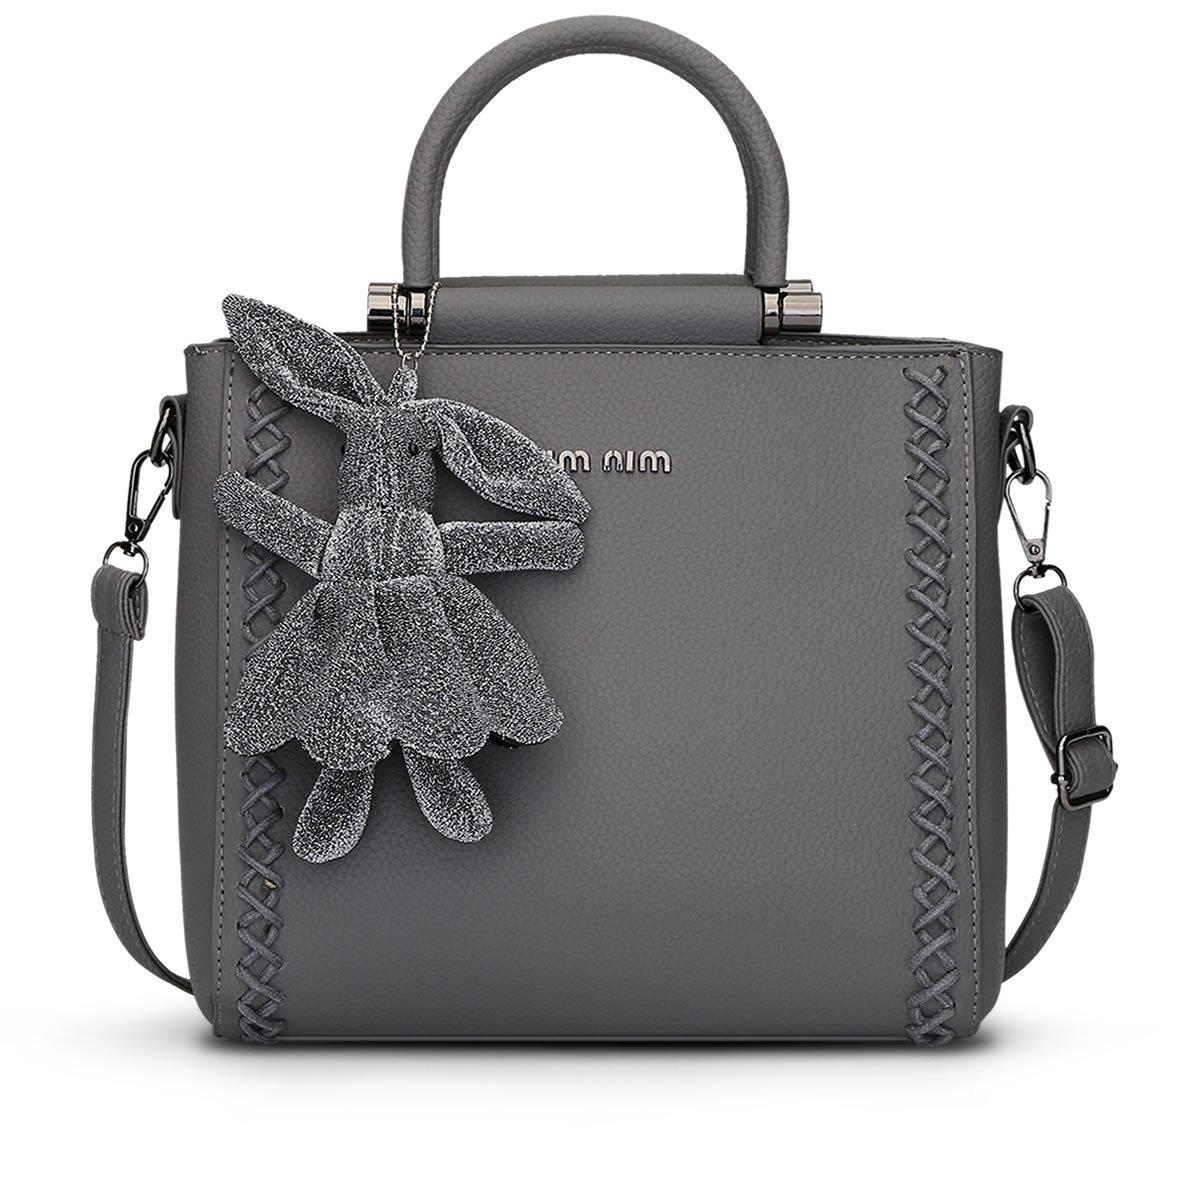 Sunshine Beauty Bag 765 exquisite retro rabbit handbag